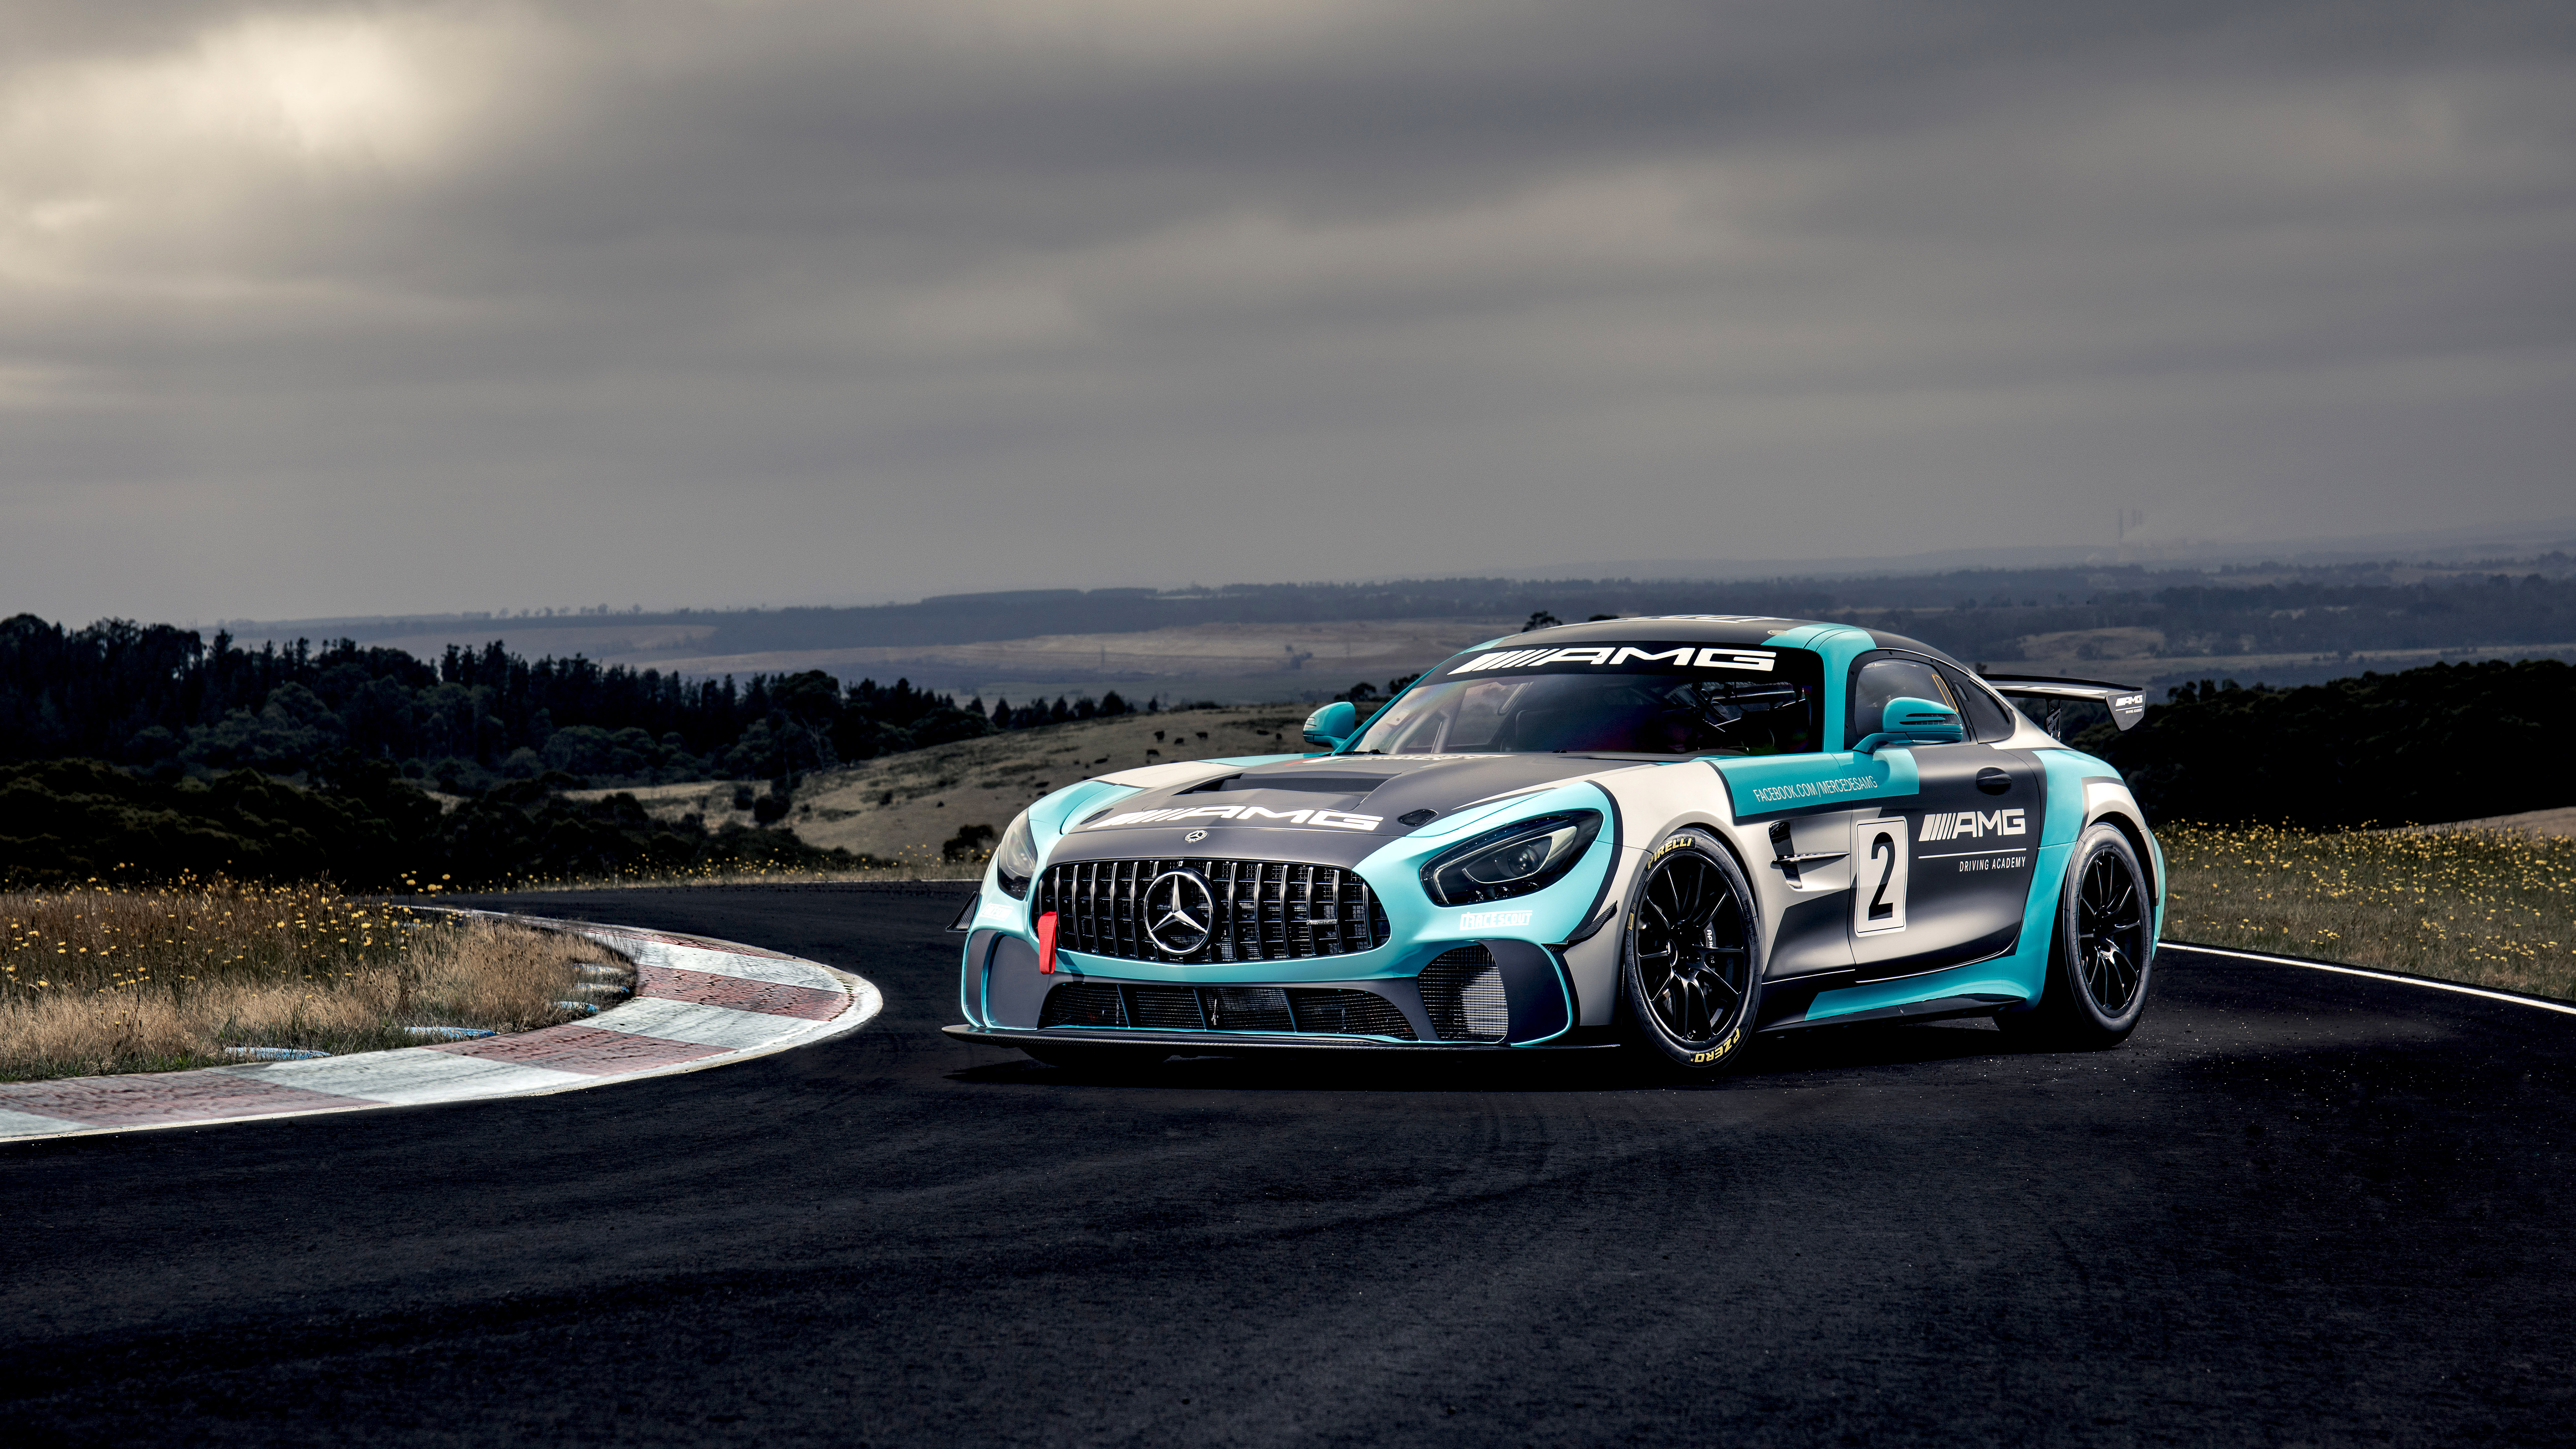 Mercedes Amg Gt4 4k 8k Wallpaper Hd Car Wallpapers Id 12584